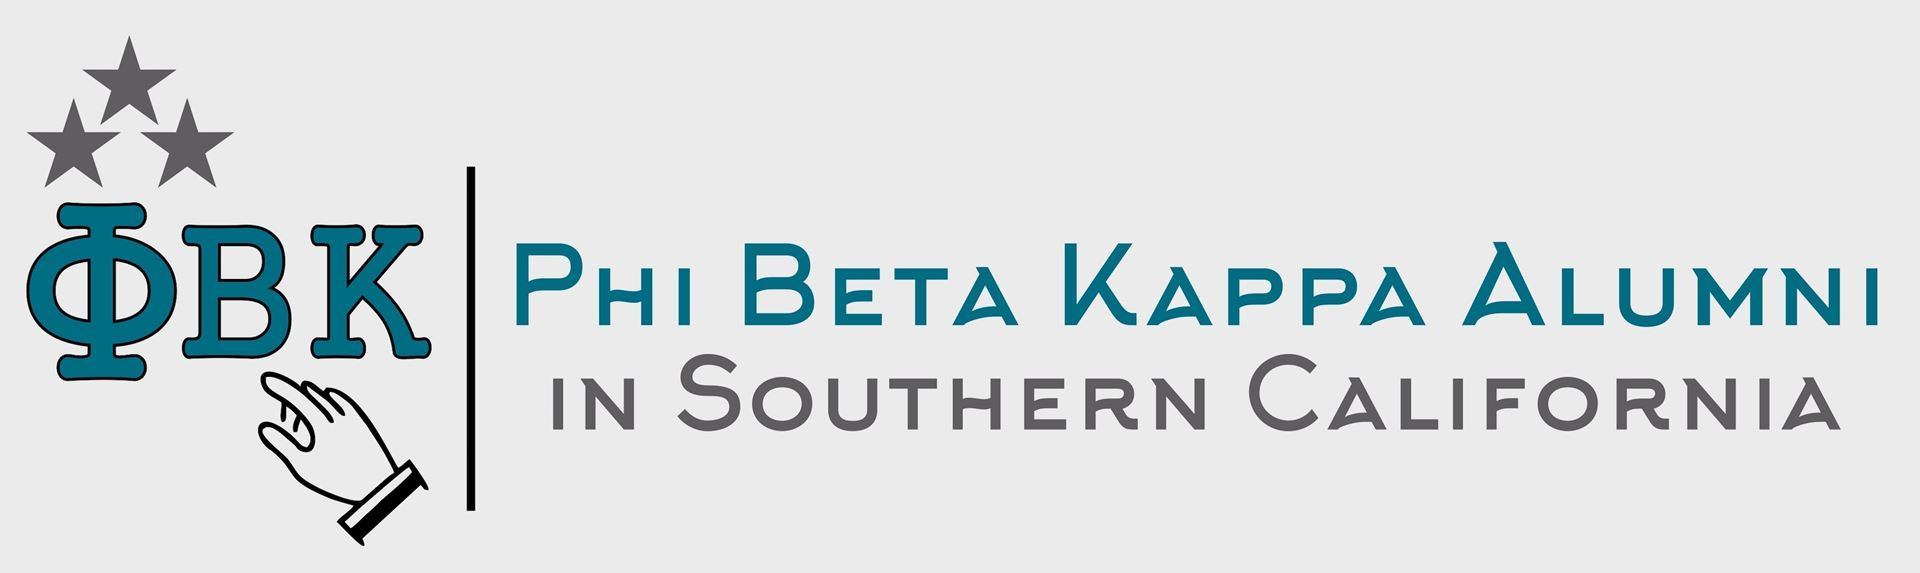 24e194751586 Phi Beta Kappa Alumni in Southern California - Home